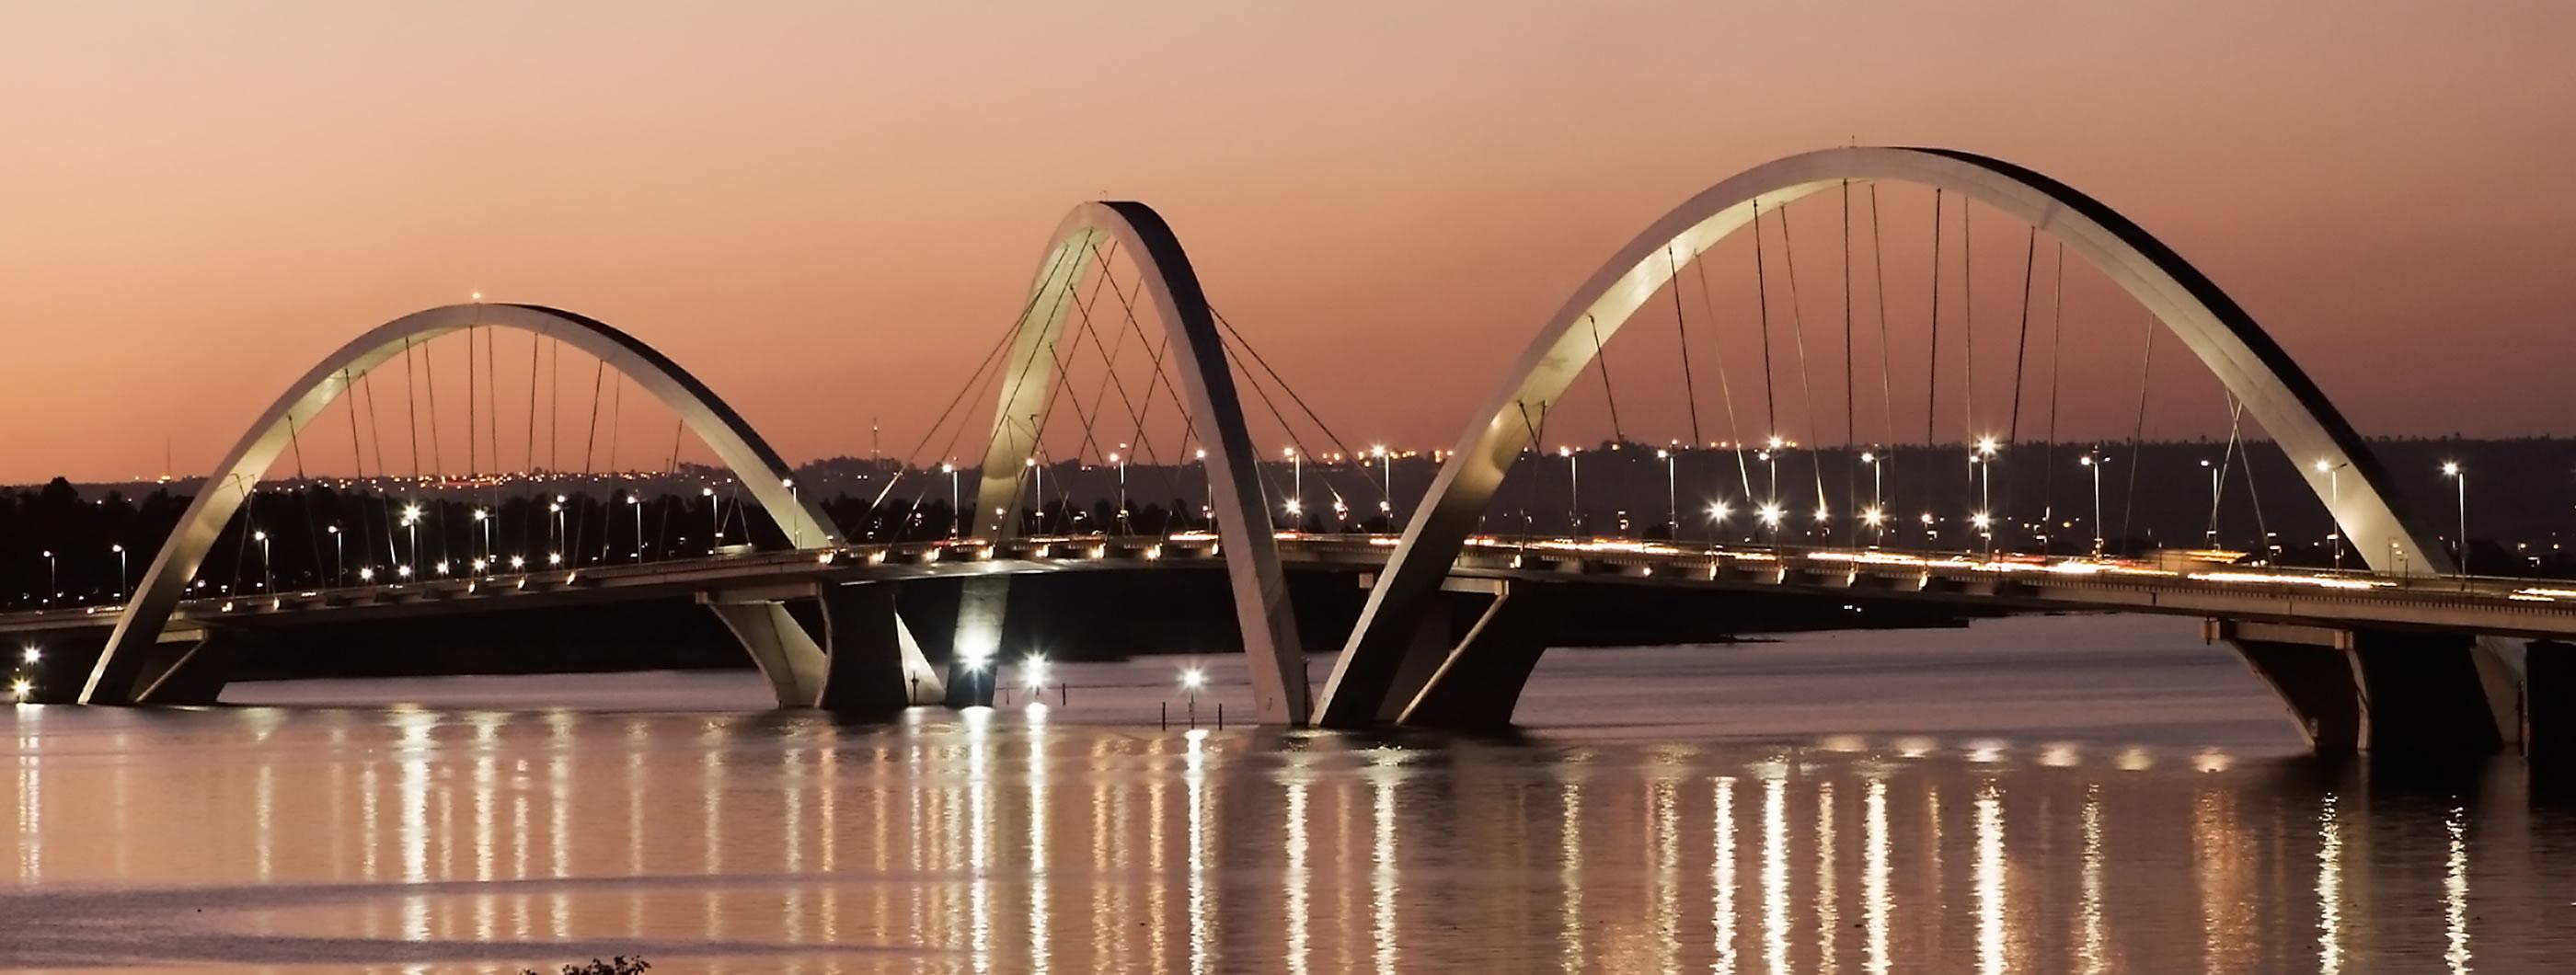 slide2-3-ponte-brasilia